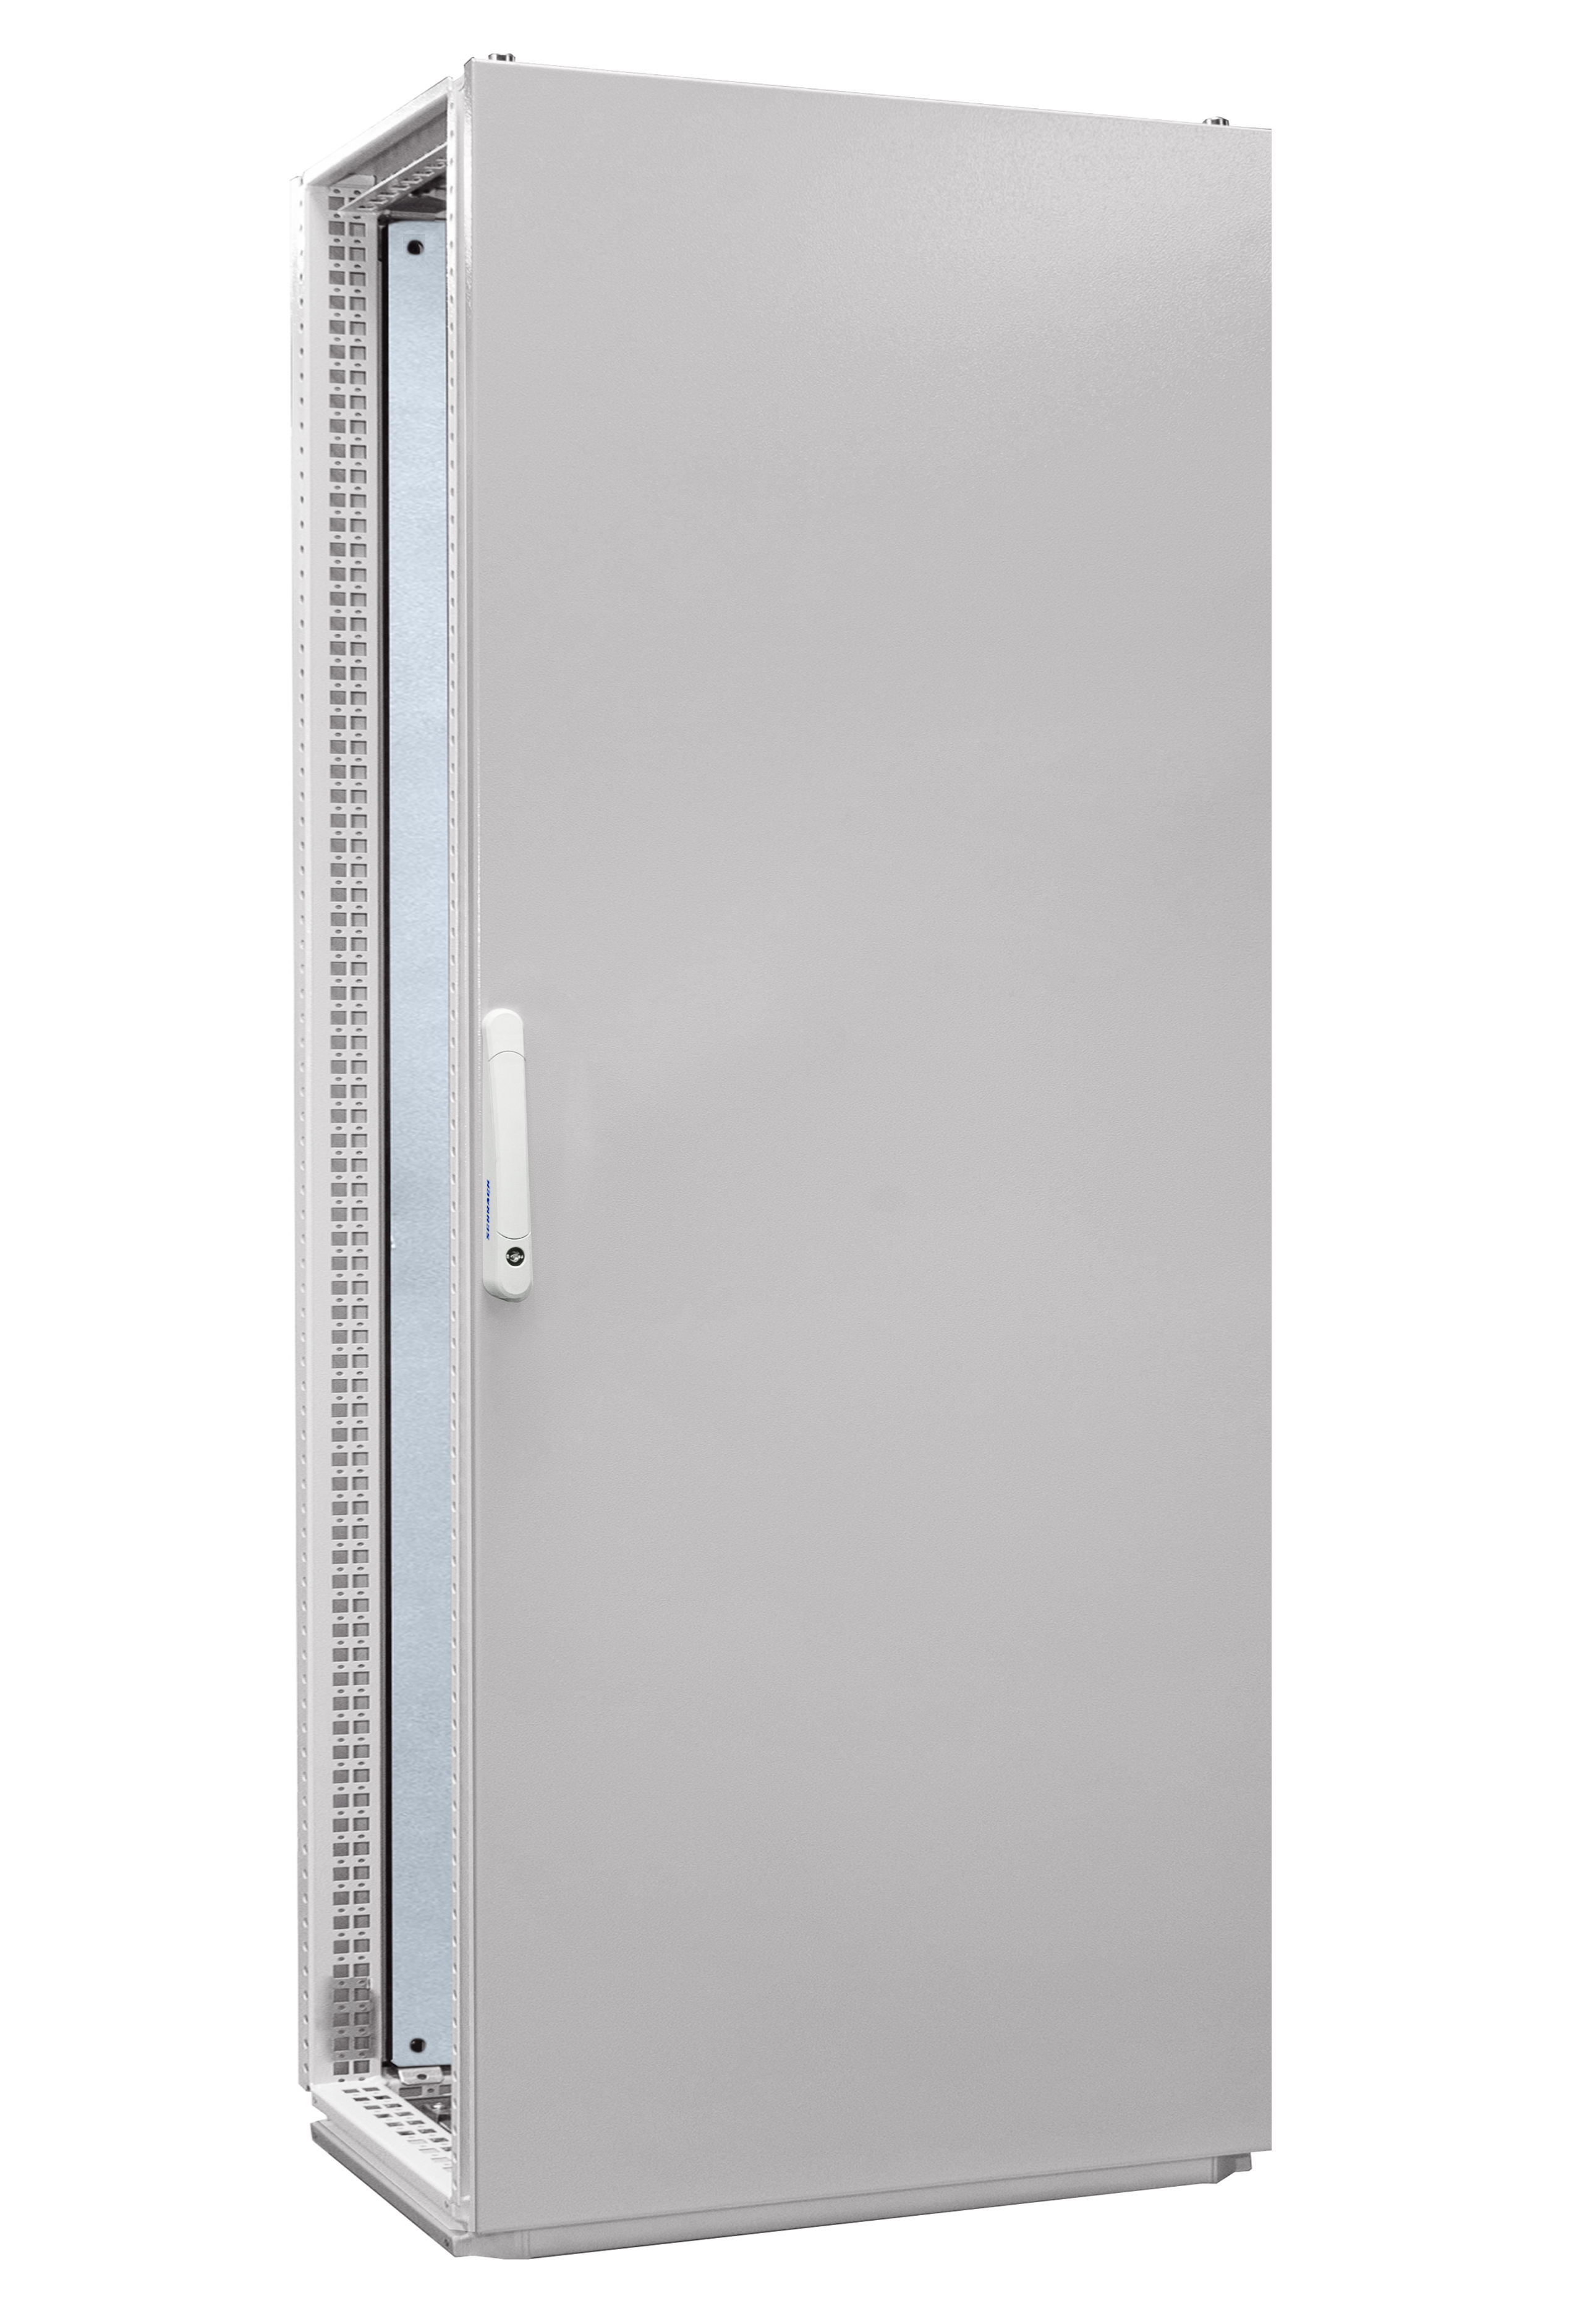 1 Stk Anreihschrank 1-Tür IP55 H=2000 B=800 T=600mm Stahlblech AC208060--